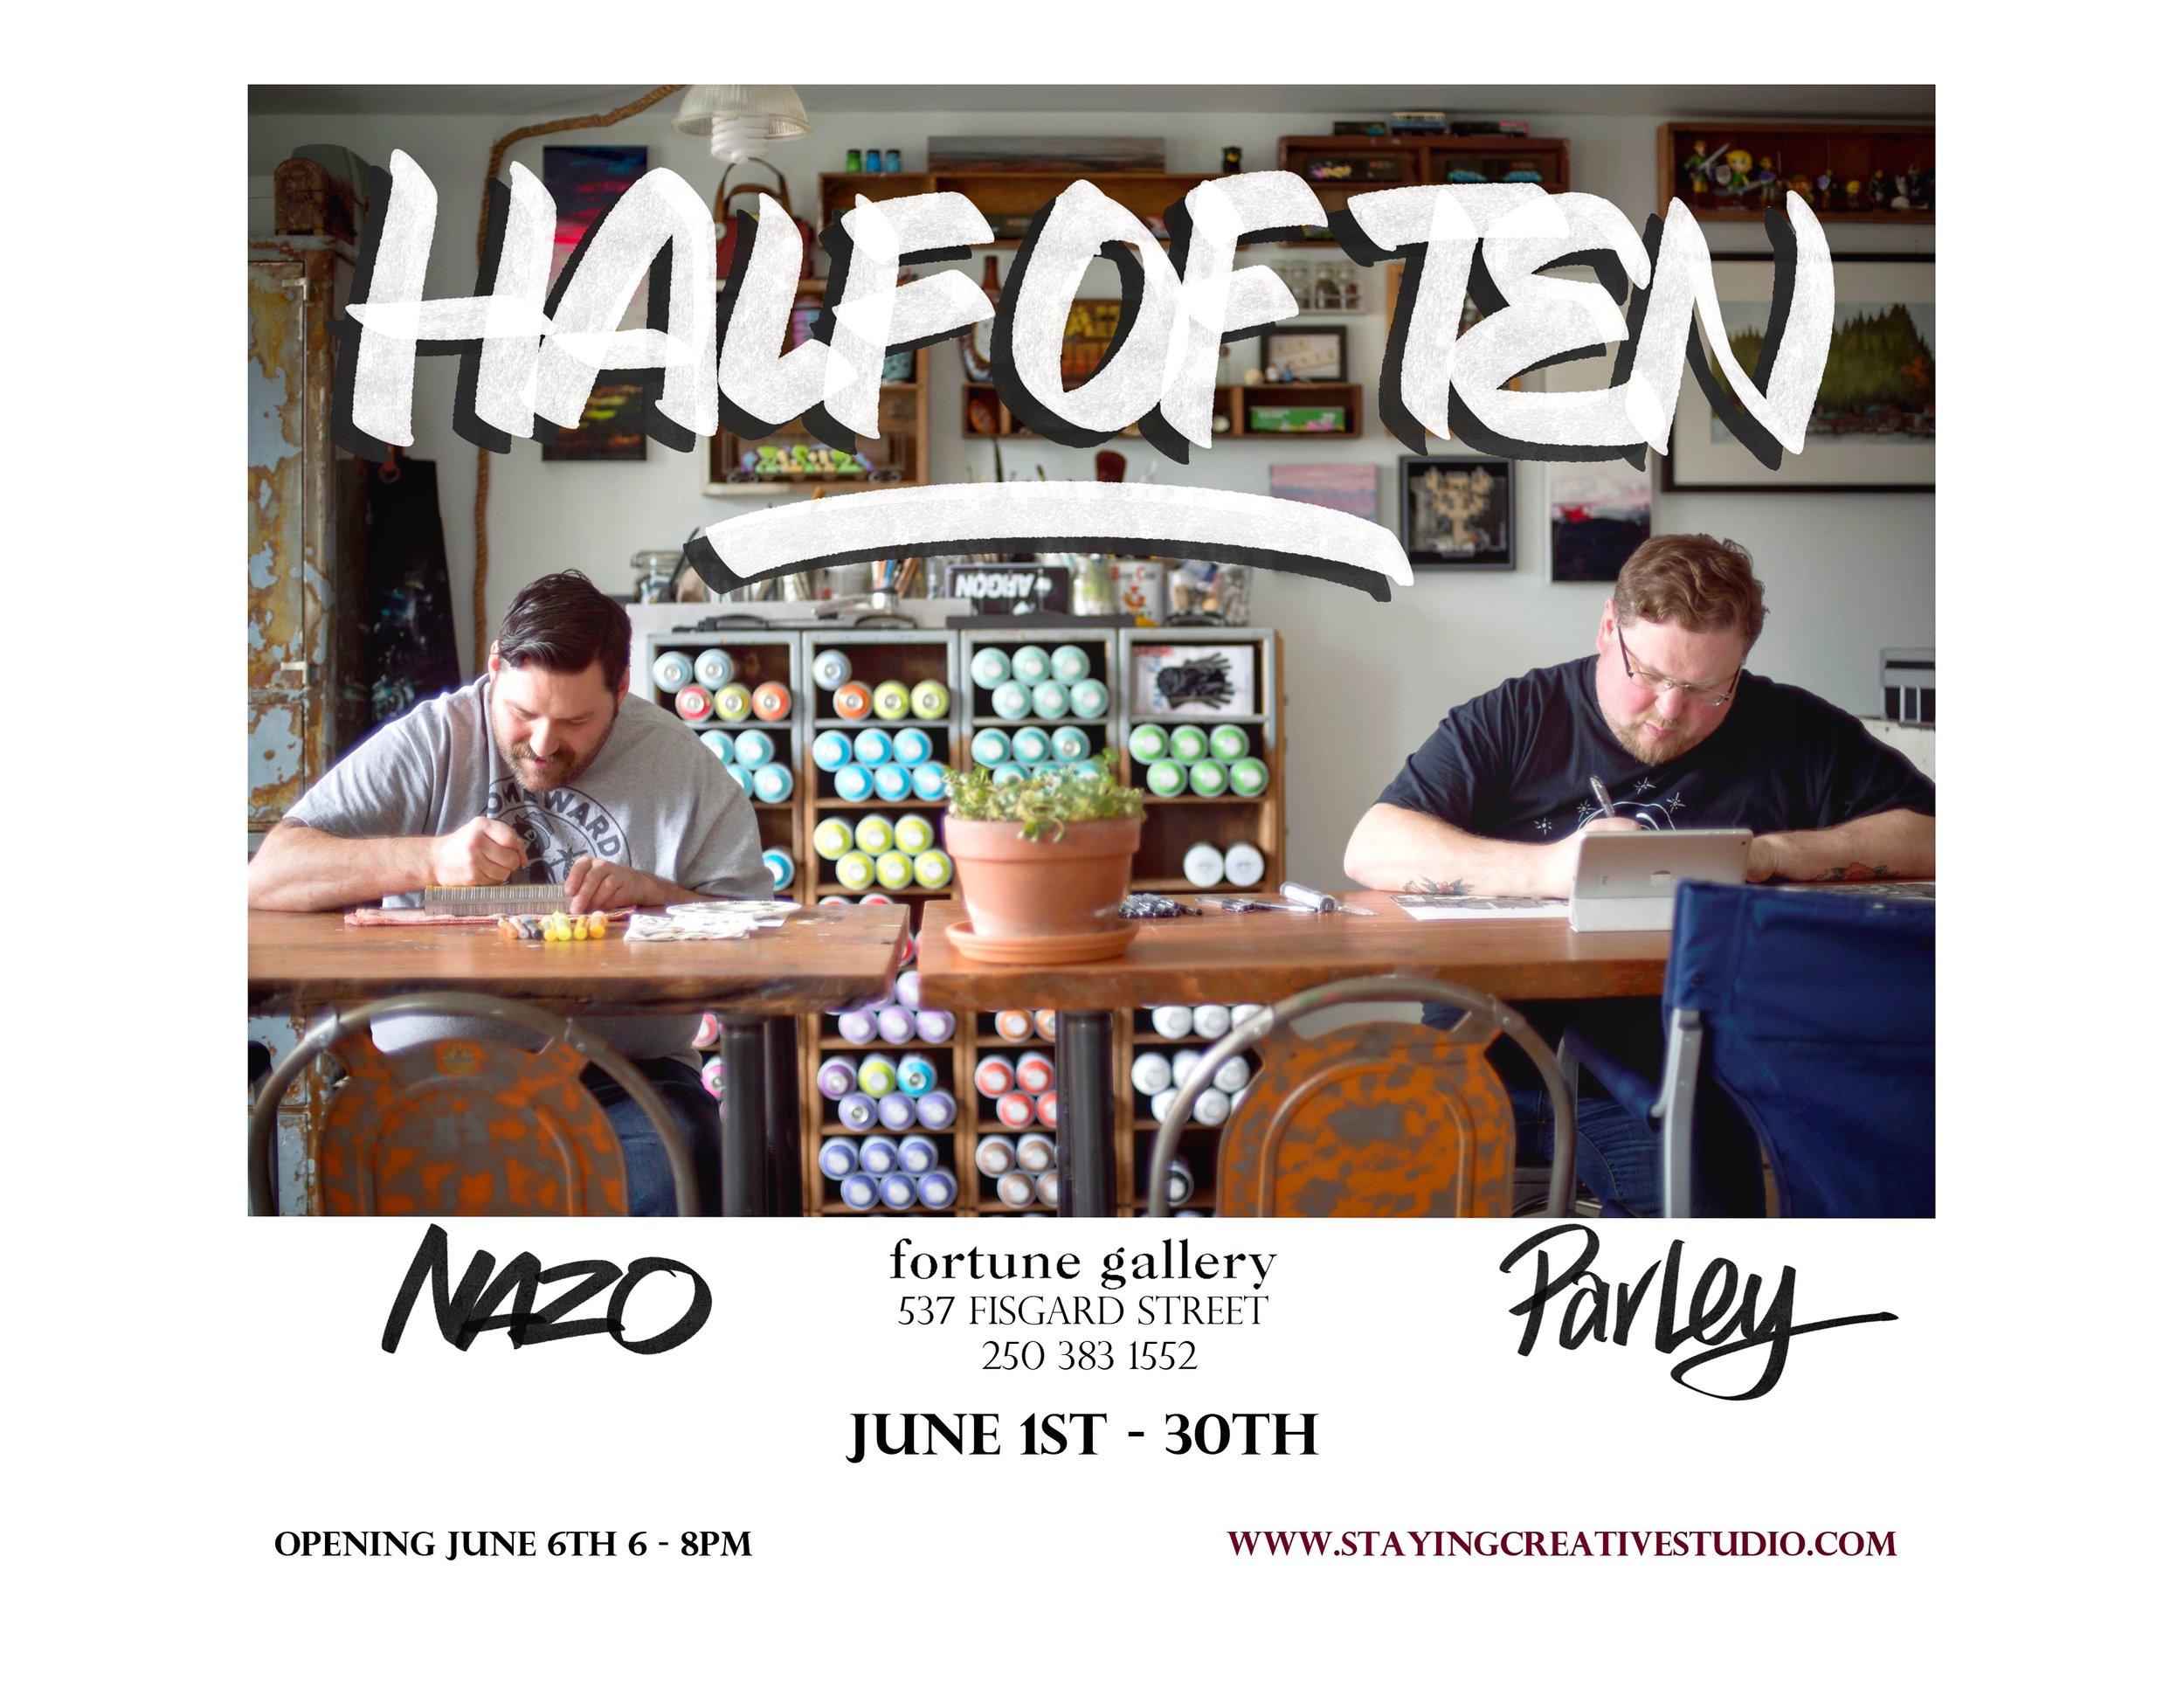 Half Of Ten - Kristofer Parley & Nathan Davis - June 1st - 30th